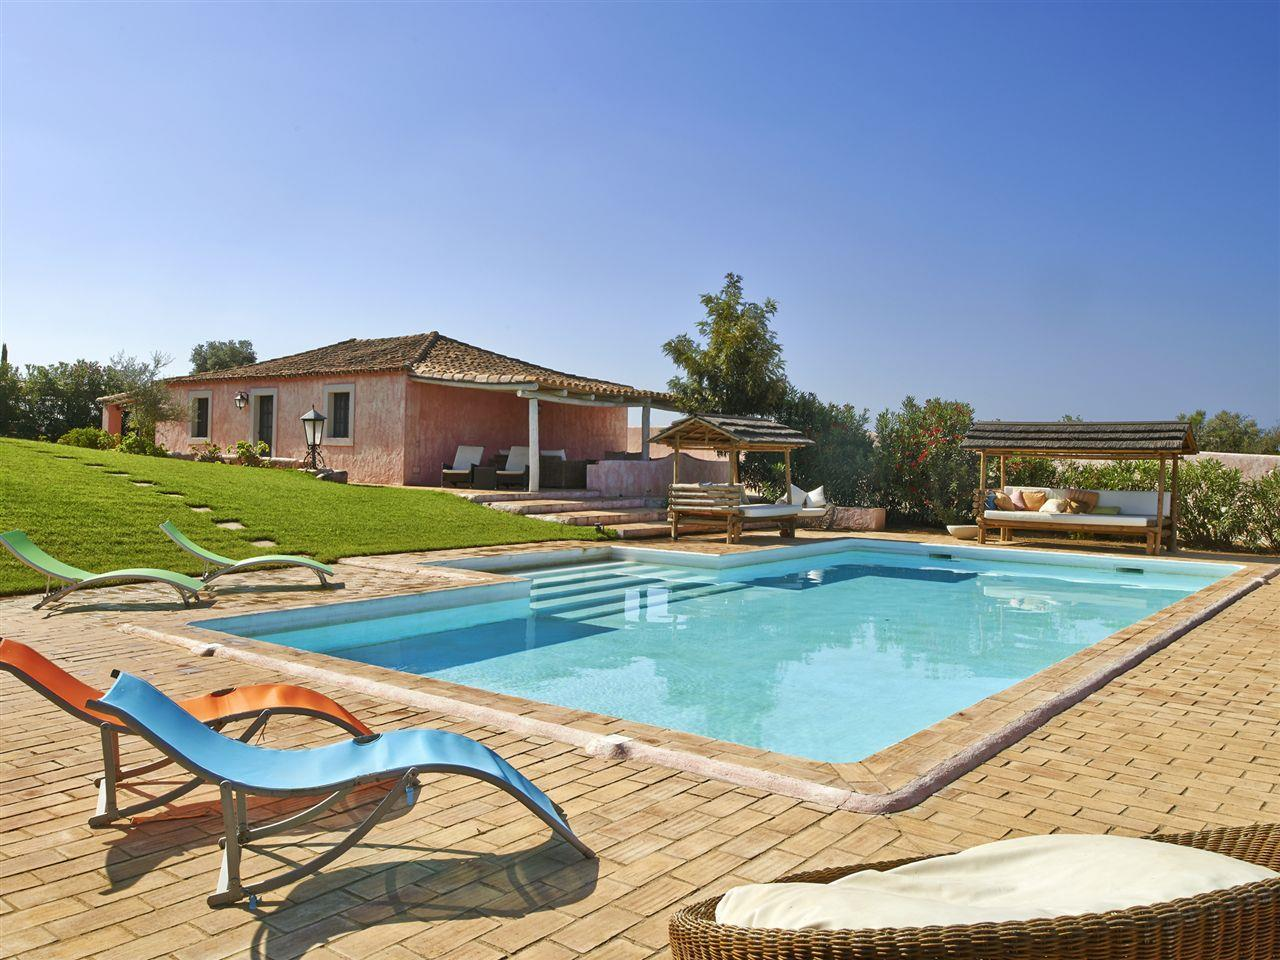 农场 / 牧场 / 种植园 为 销售 在 Farm, 9 bedrooms, for Sale Loule, Algarve 葡萄牙